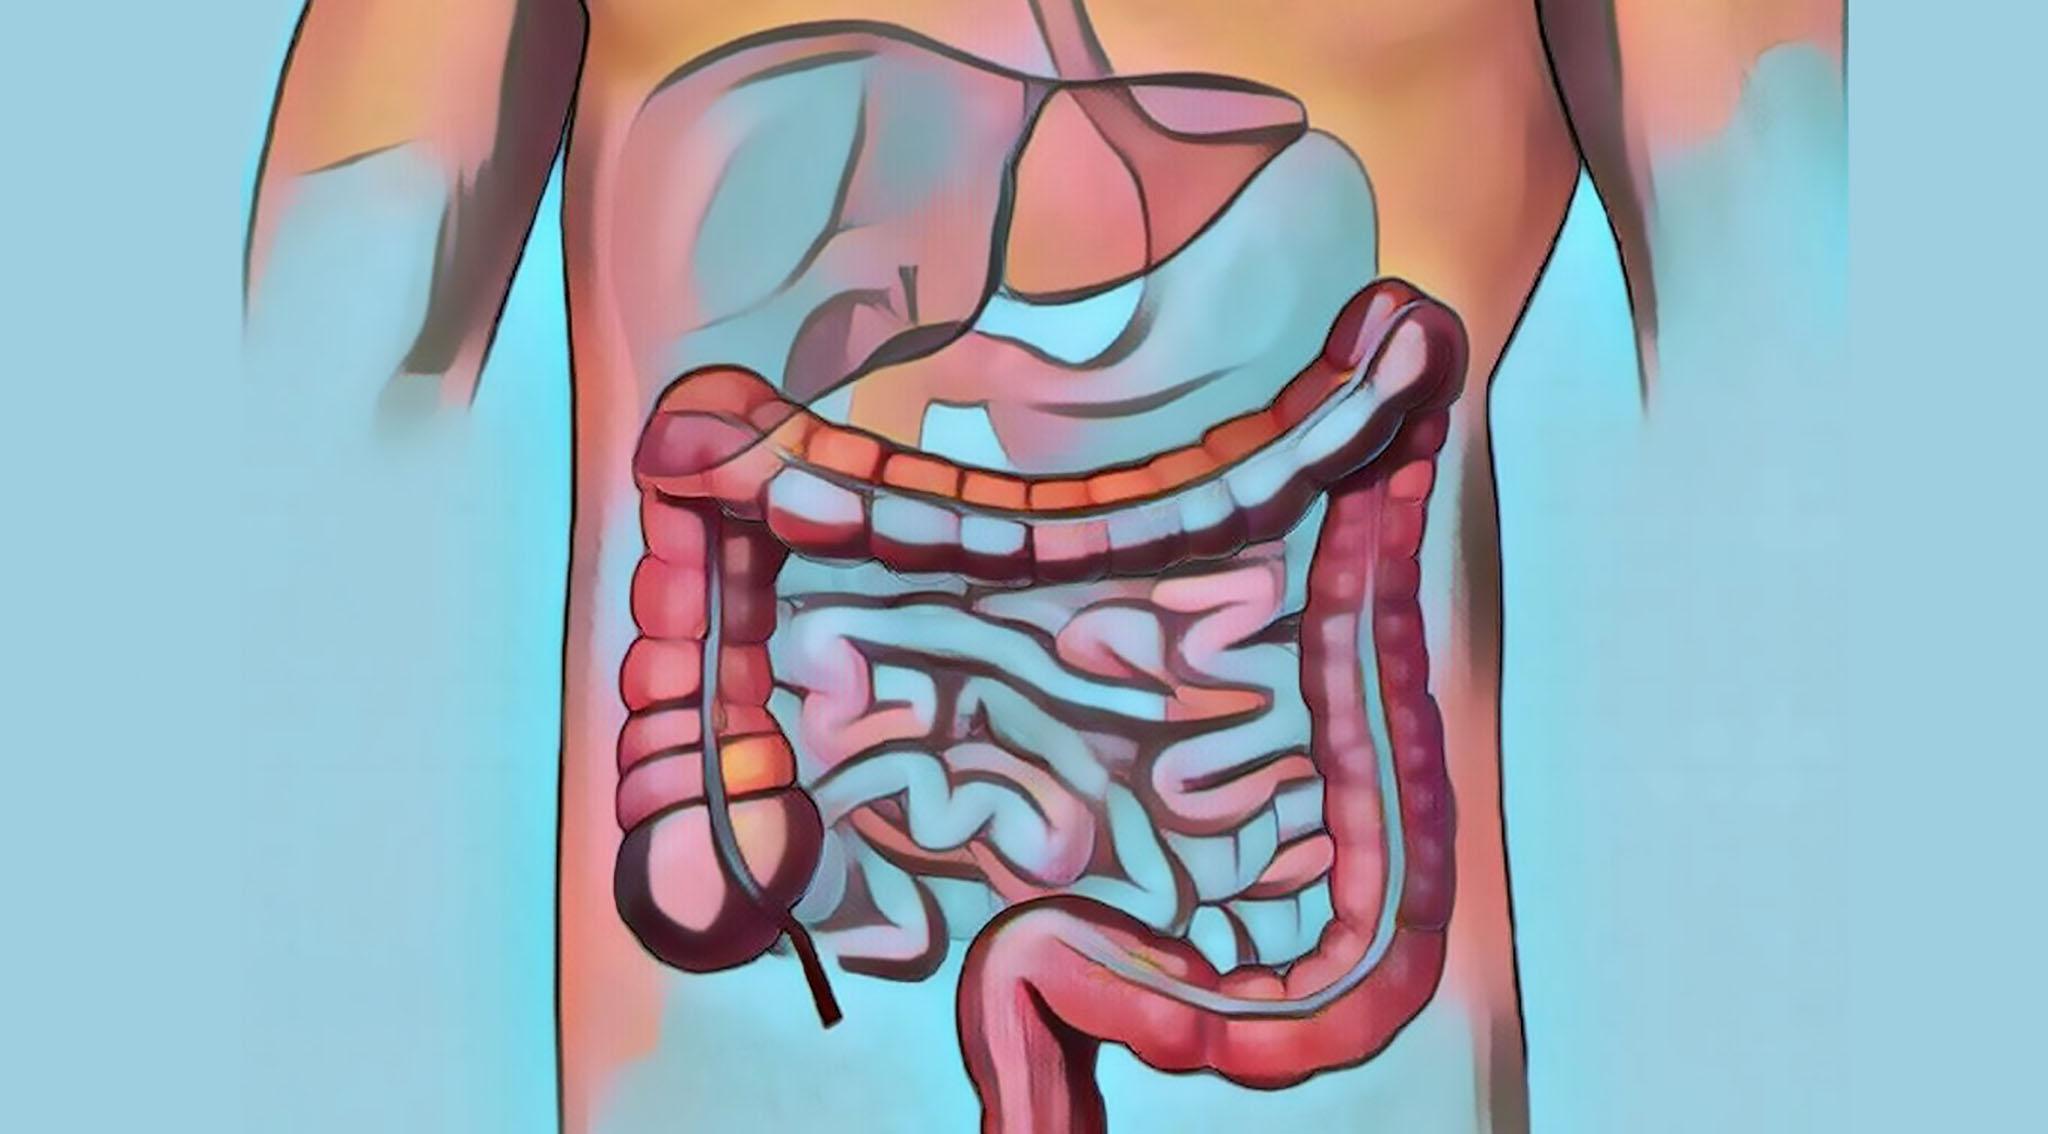 Irritable bowel syndrome artist rendering